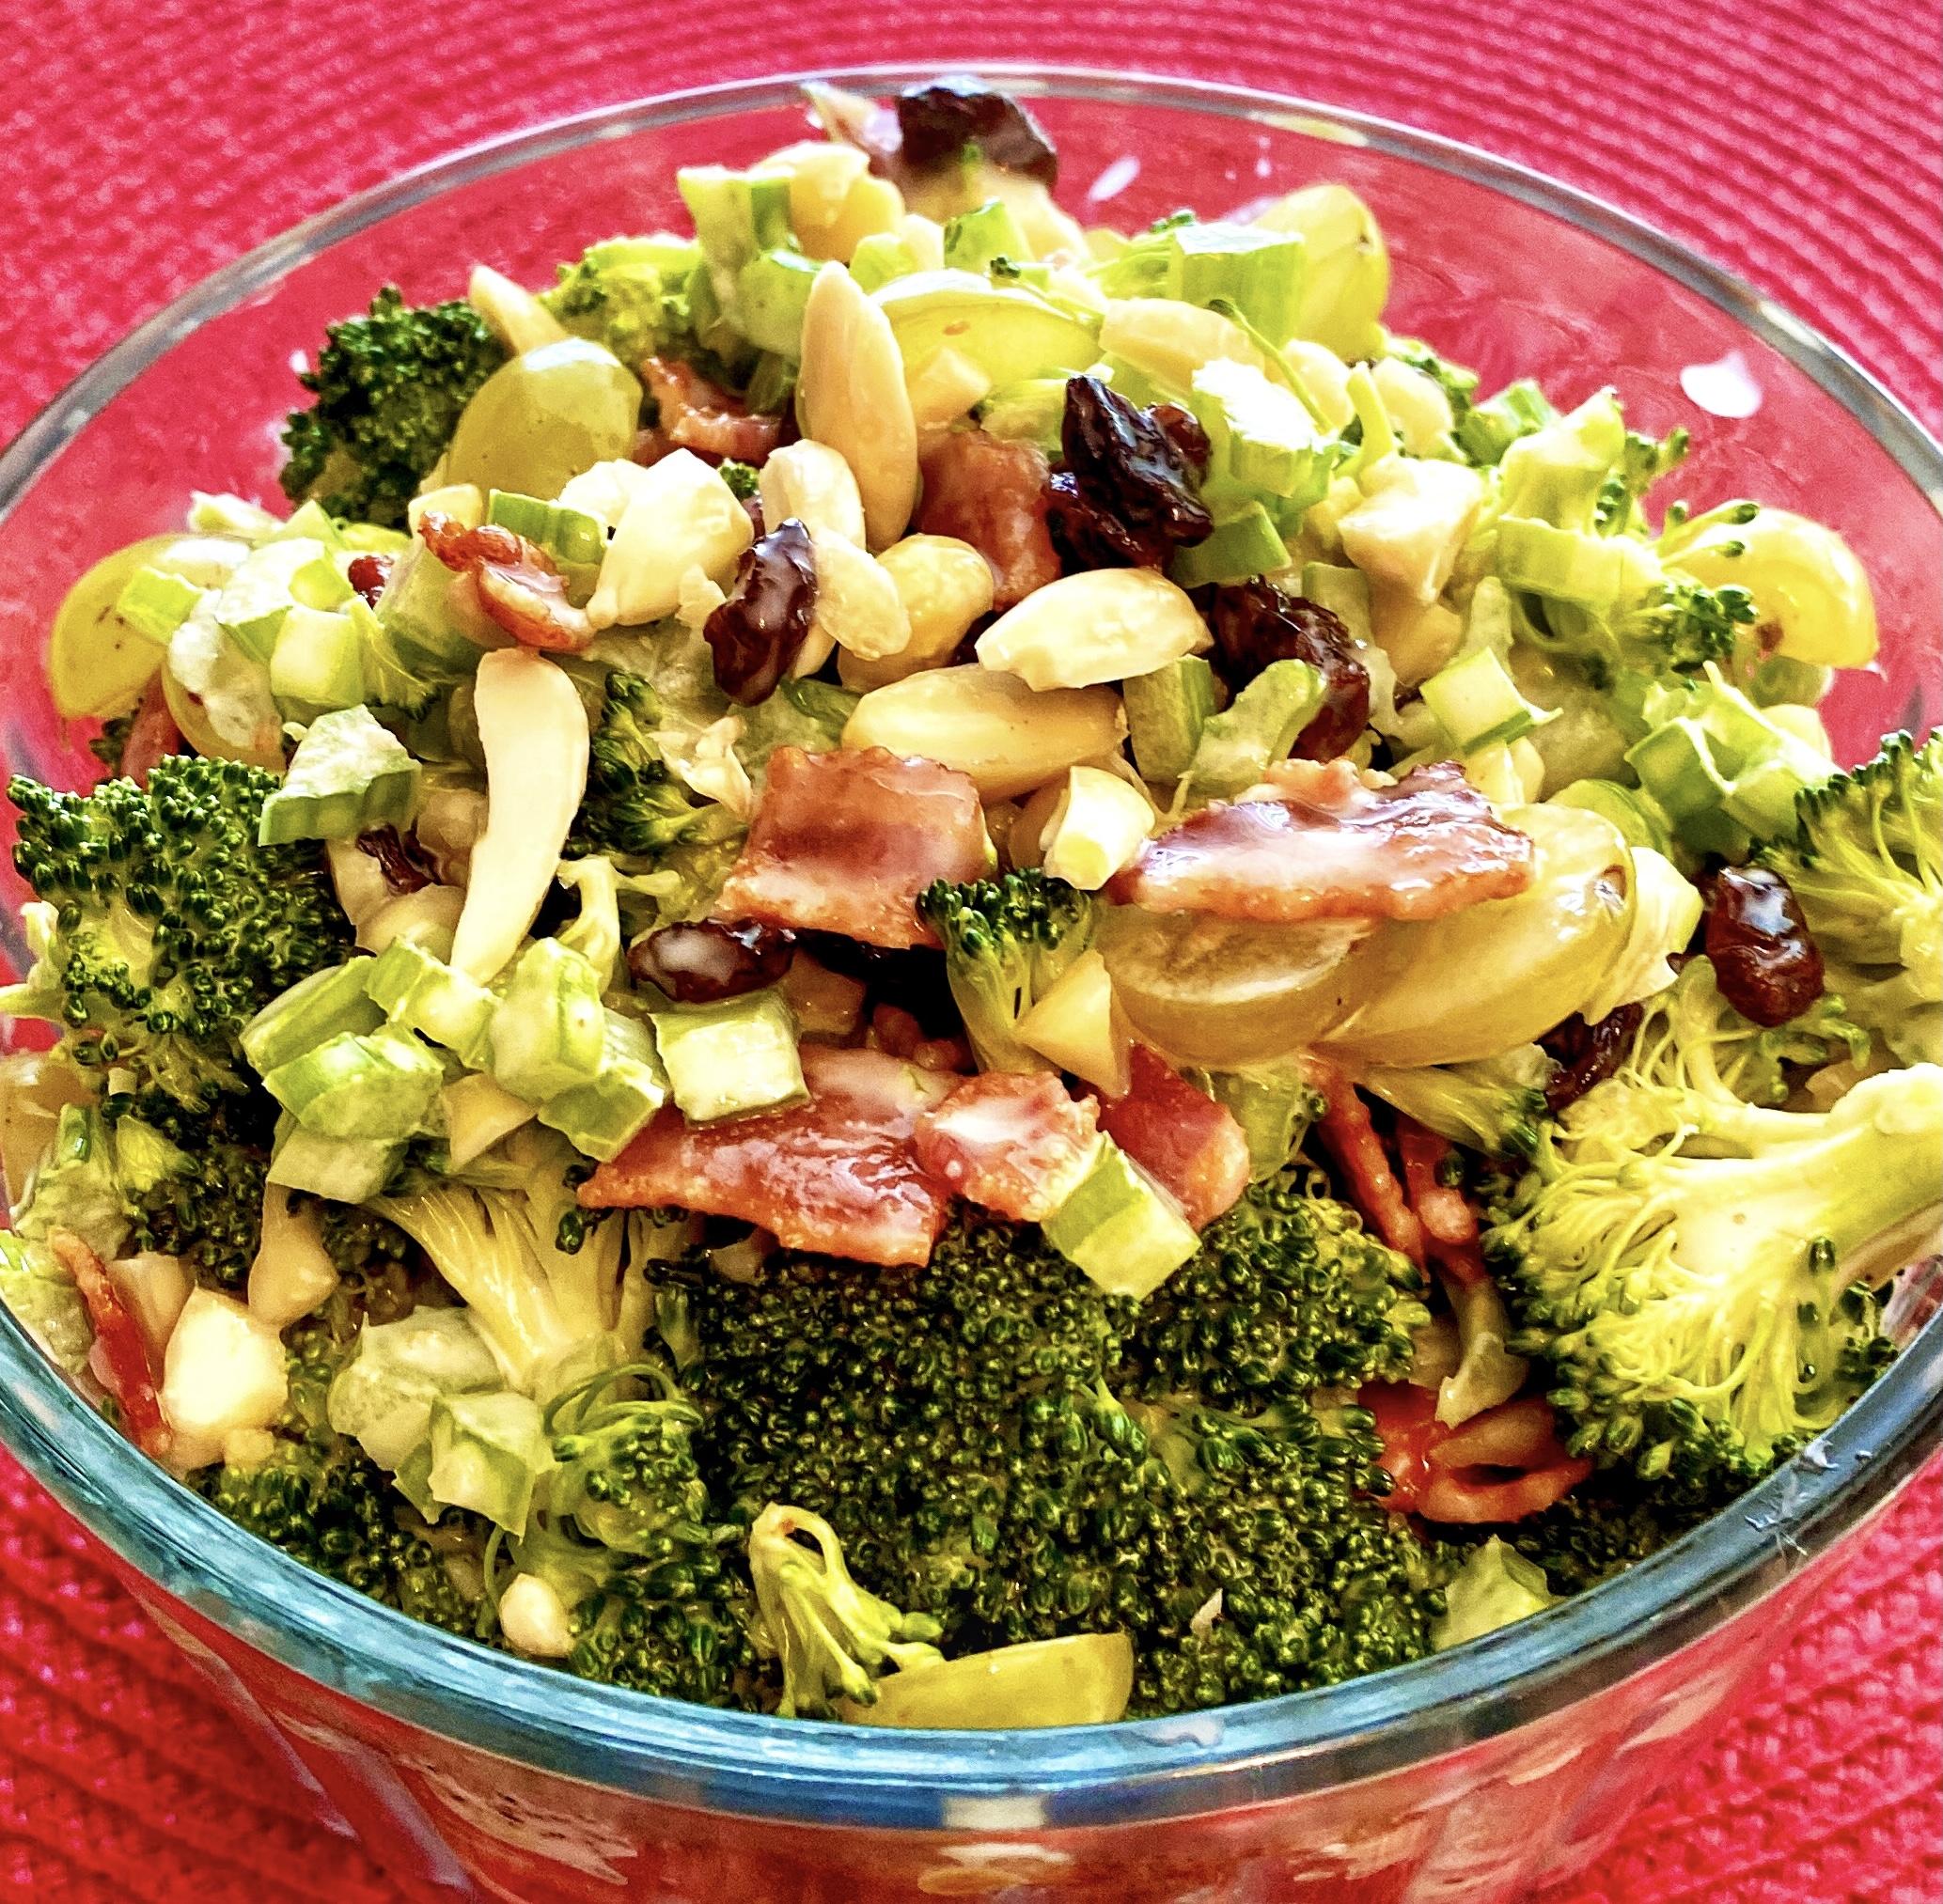 Broccoli Salad with Grapes